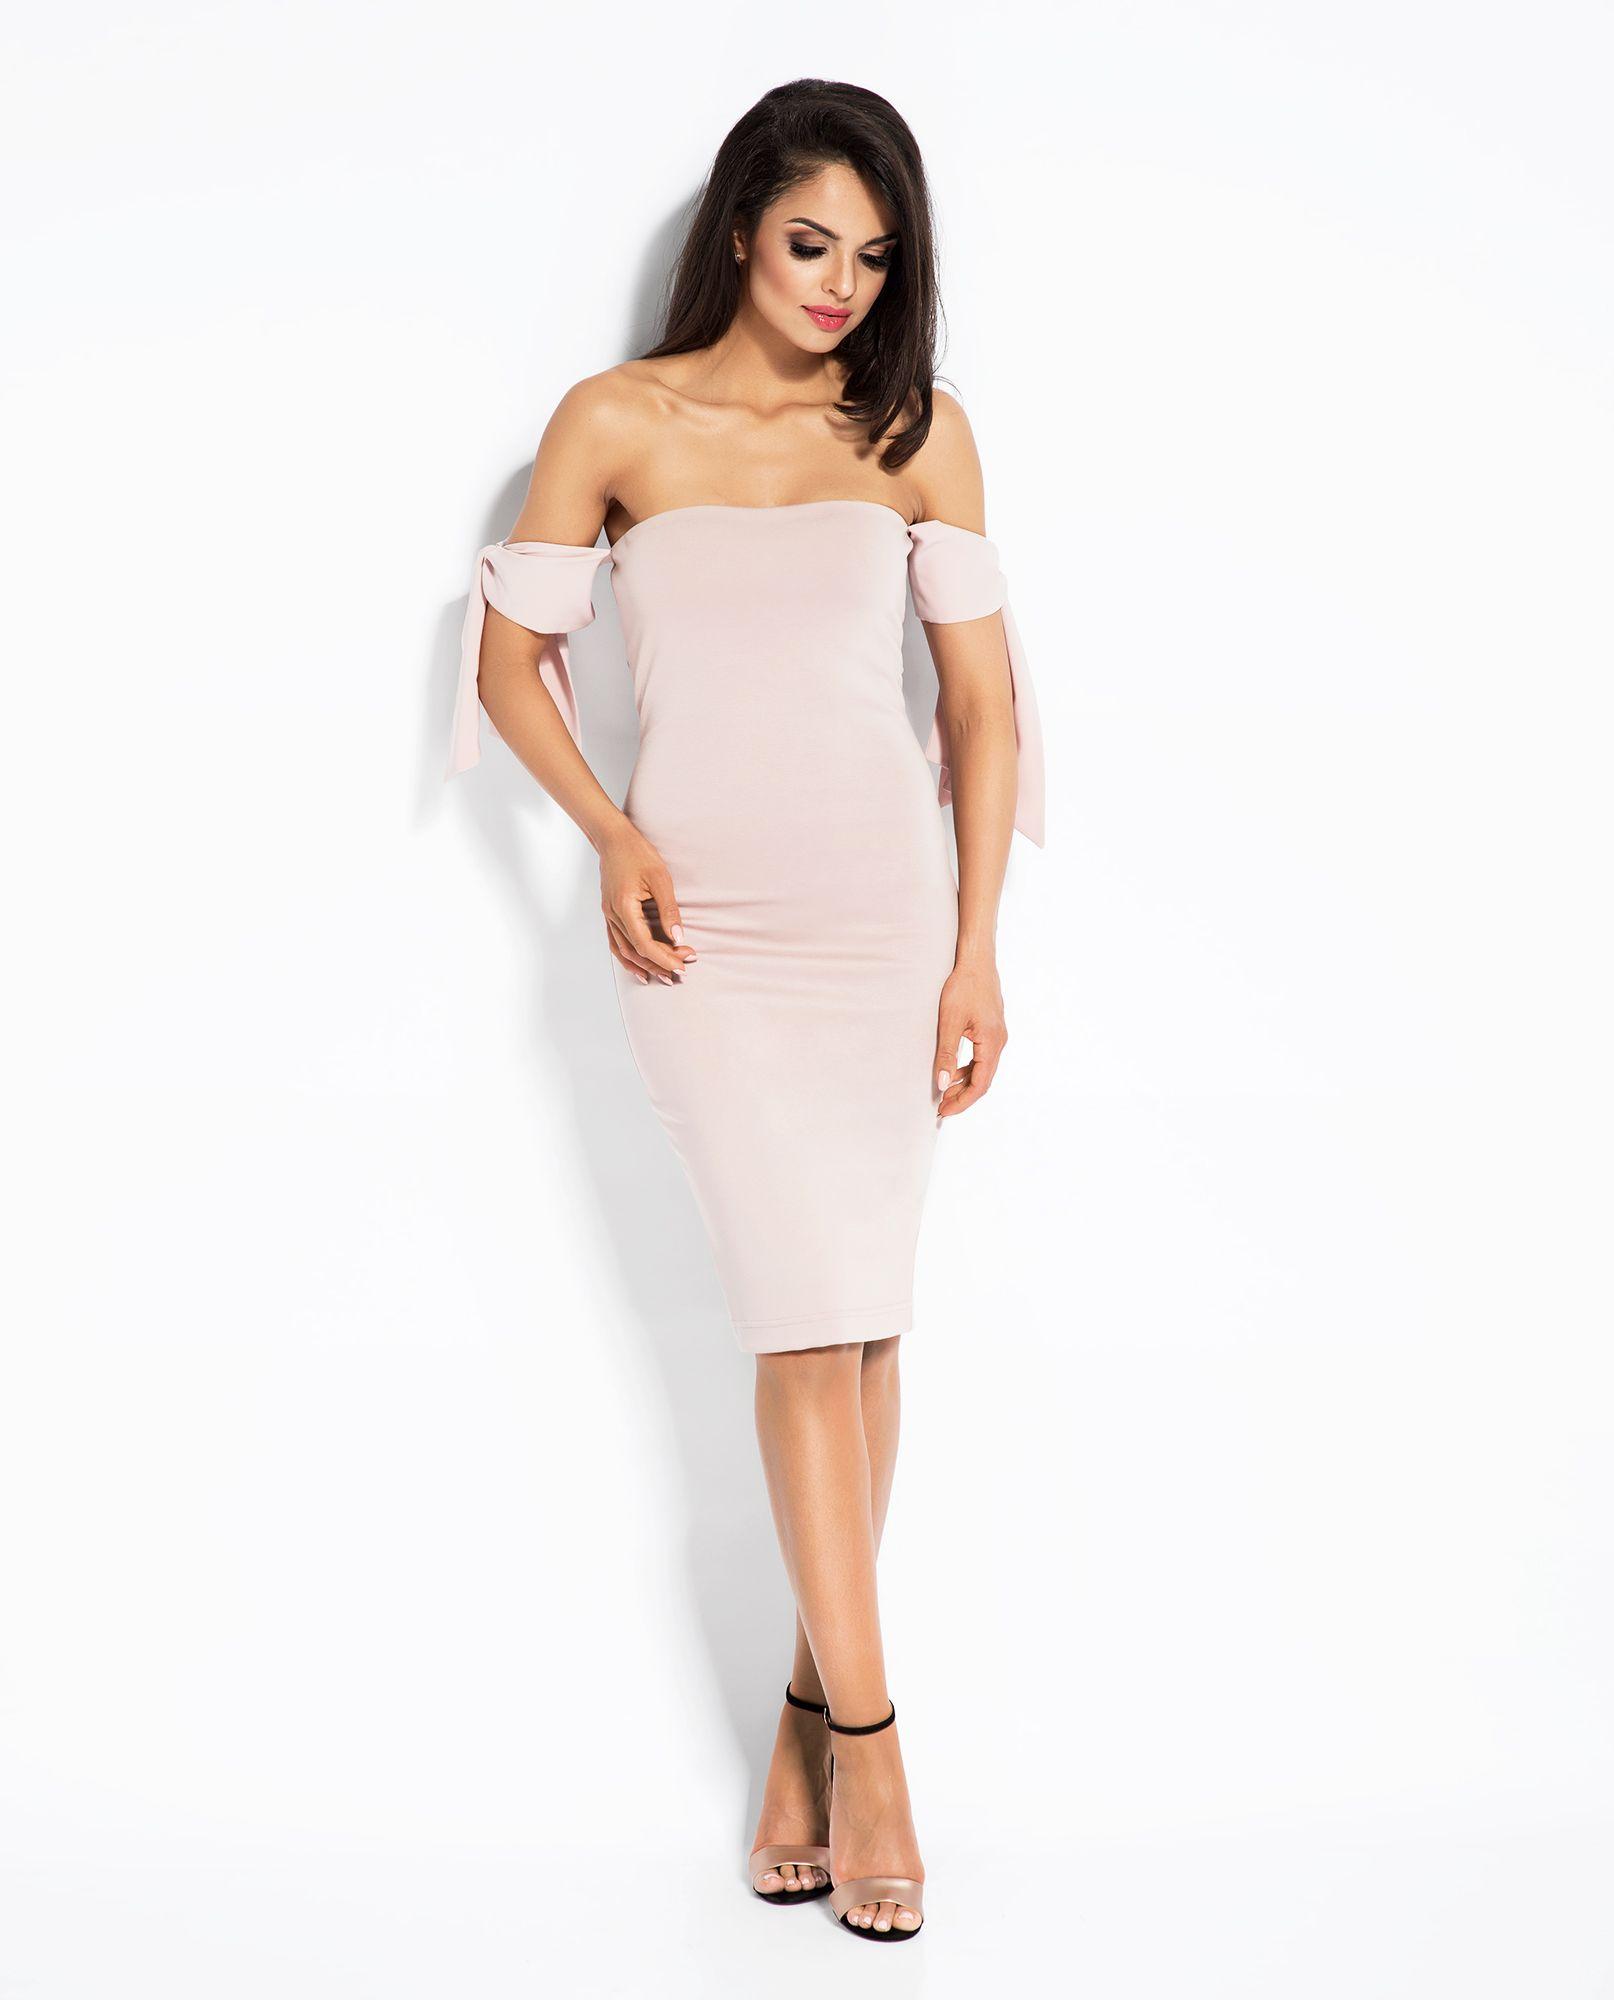 d749bfc2 Sukienka Adele 1024 - cena - 189.00 zł   Sukienki